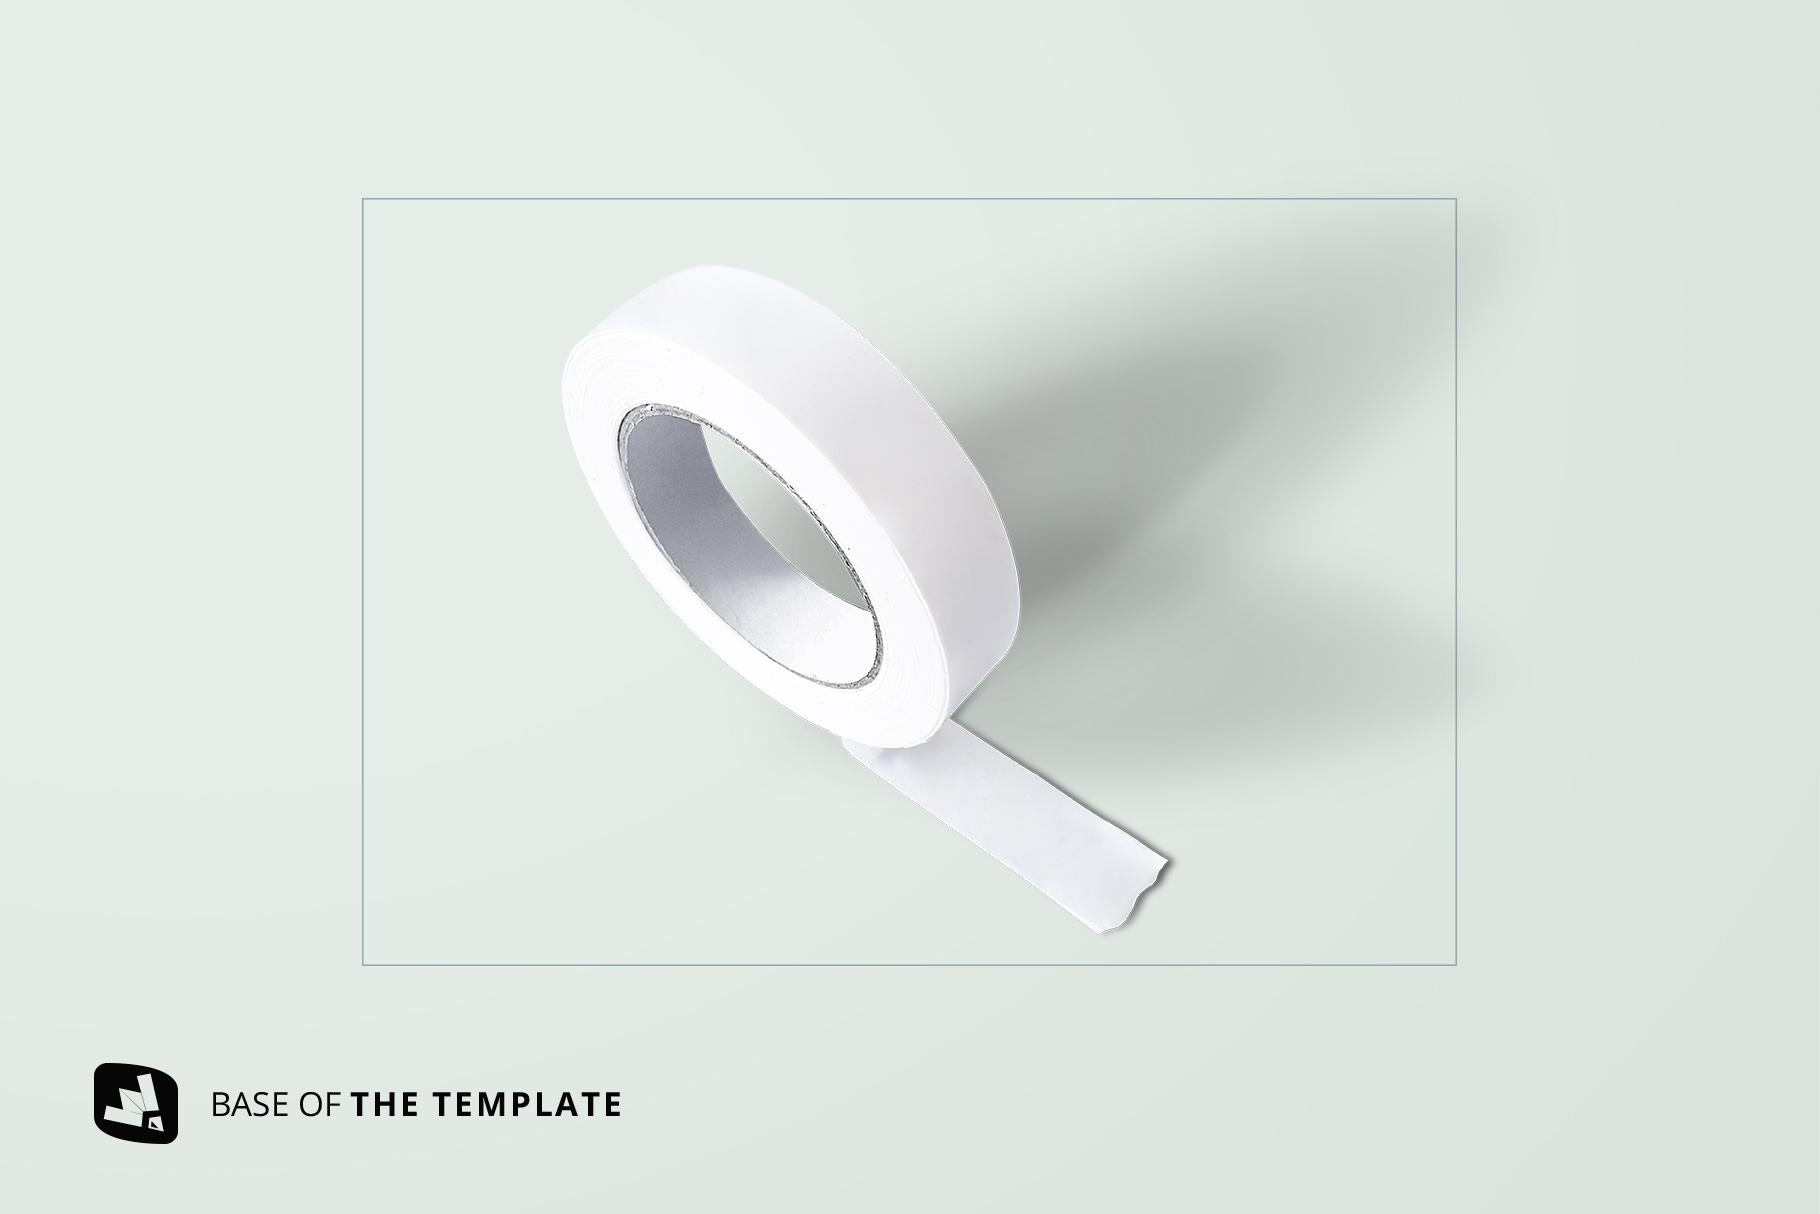 base image of the themed washi tape roll mockup